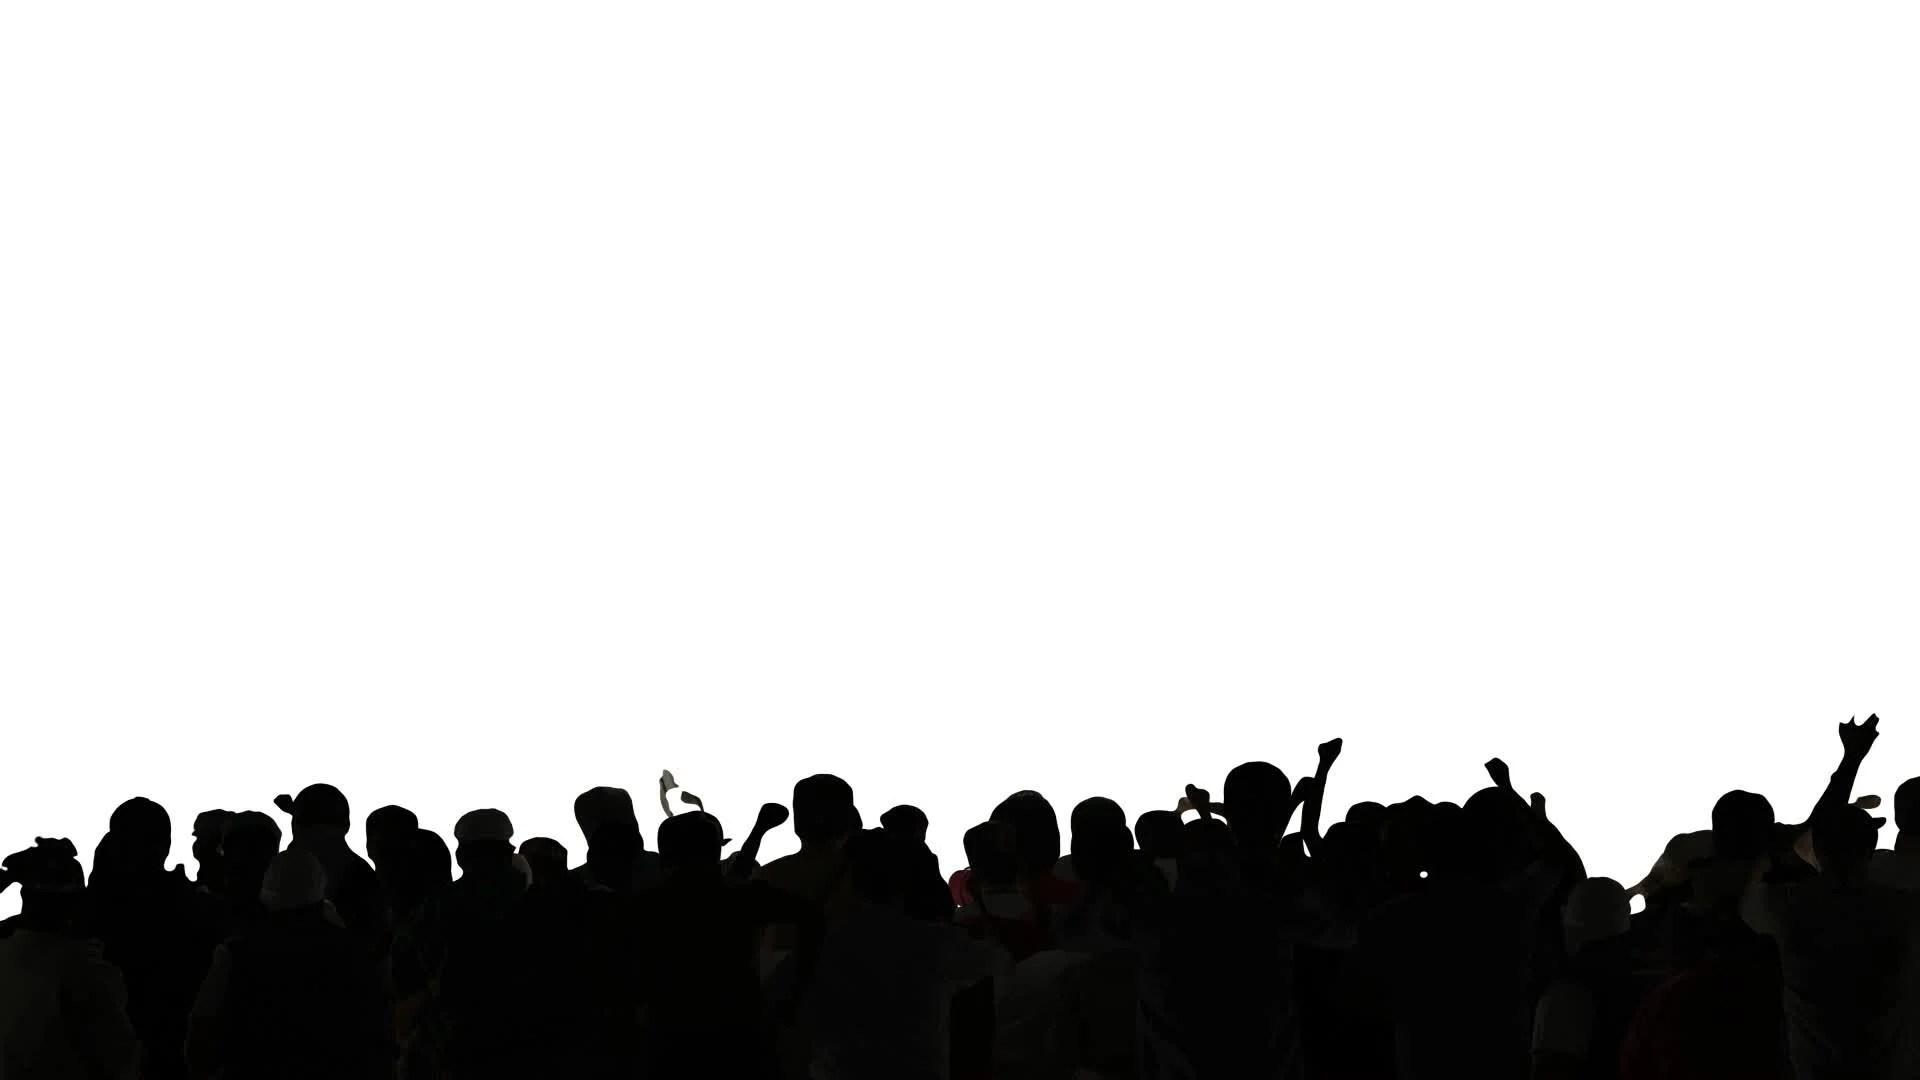 Vintage Car Wallpaper Transparent Video Concert Crowd Dancing Silhouettes Hd 12378774